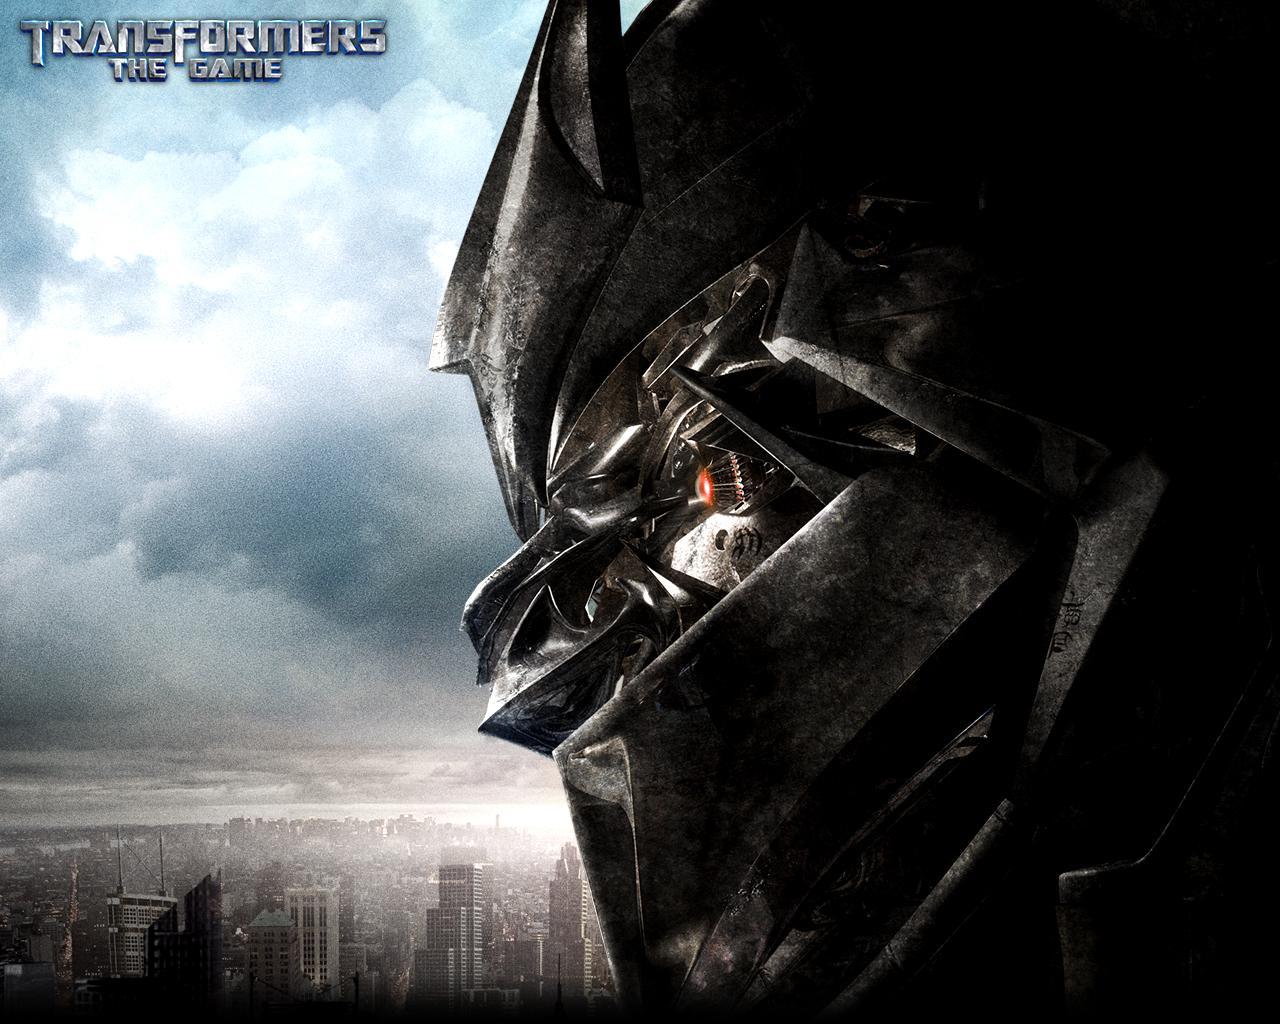 Games e wallpapers wallpaper papel de parede games 09 - Transformers tapete ...